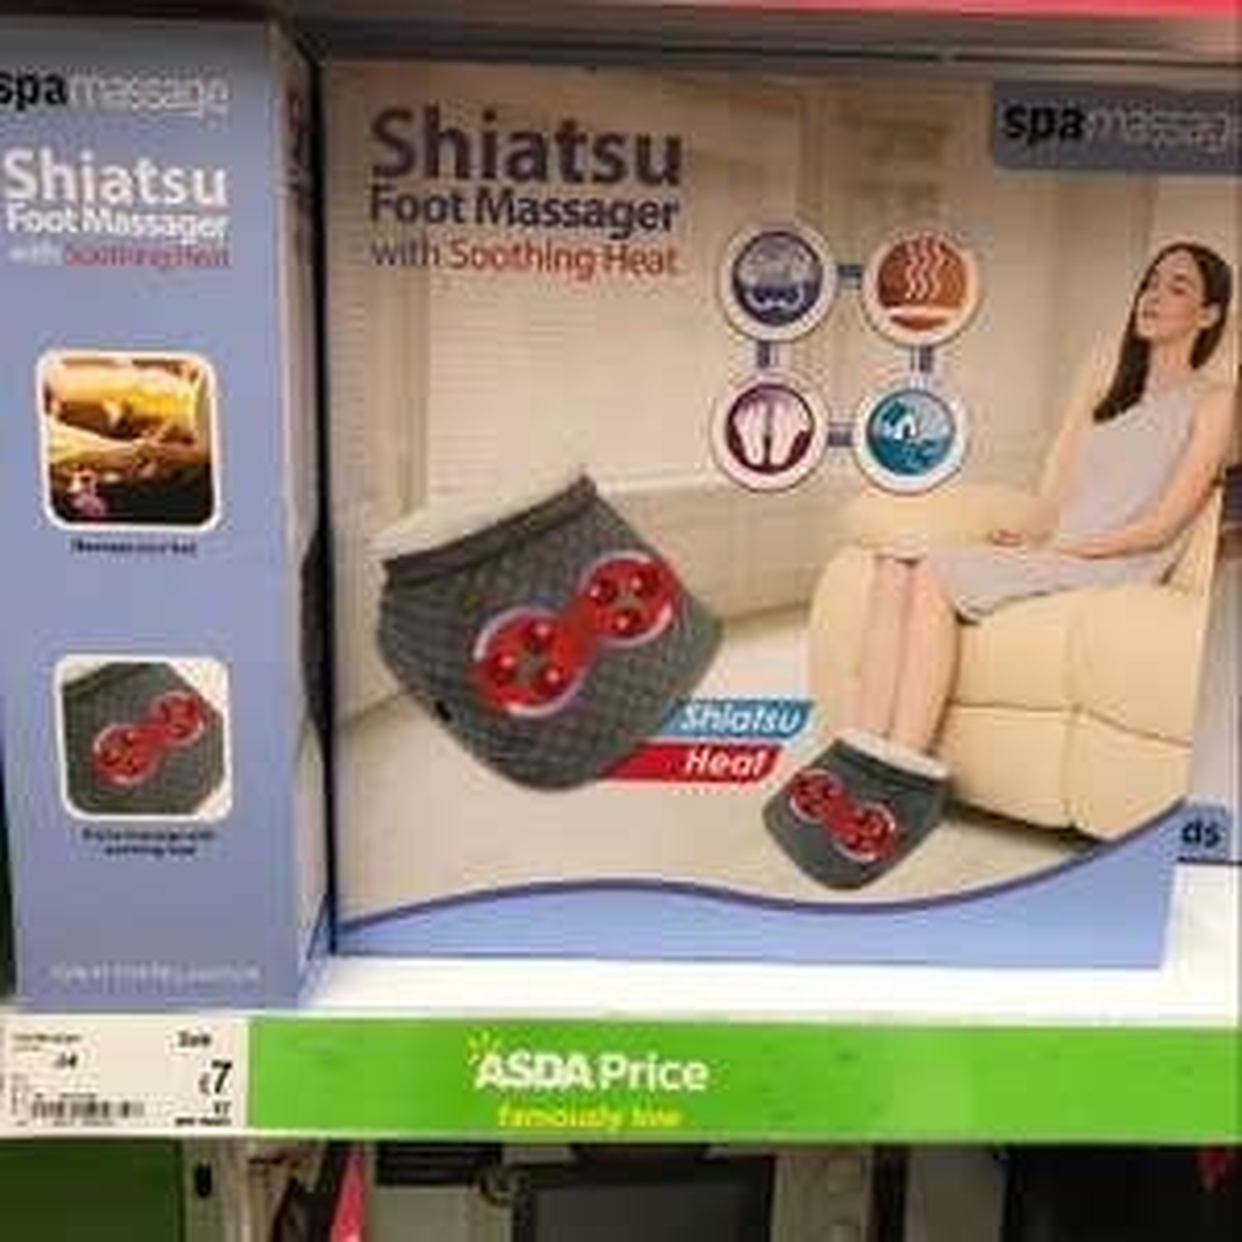 Shiatsu foot massager for £7 half price sale at ASDA